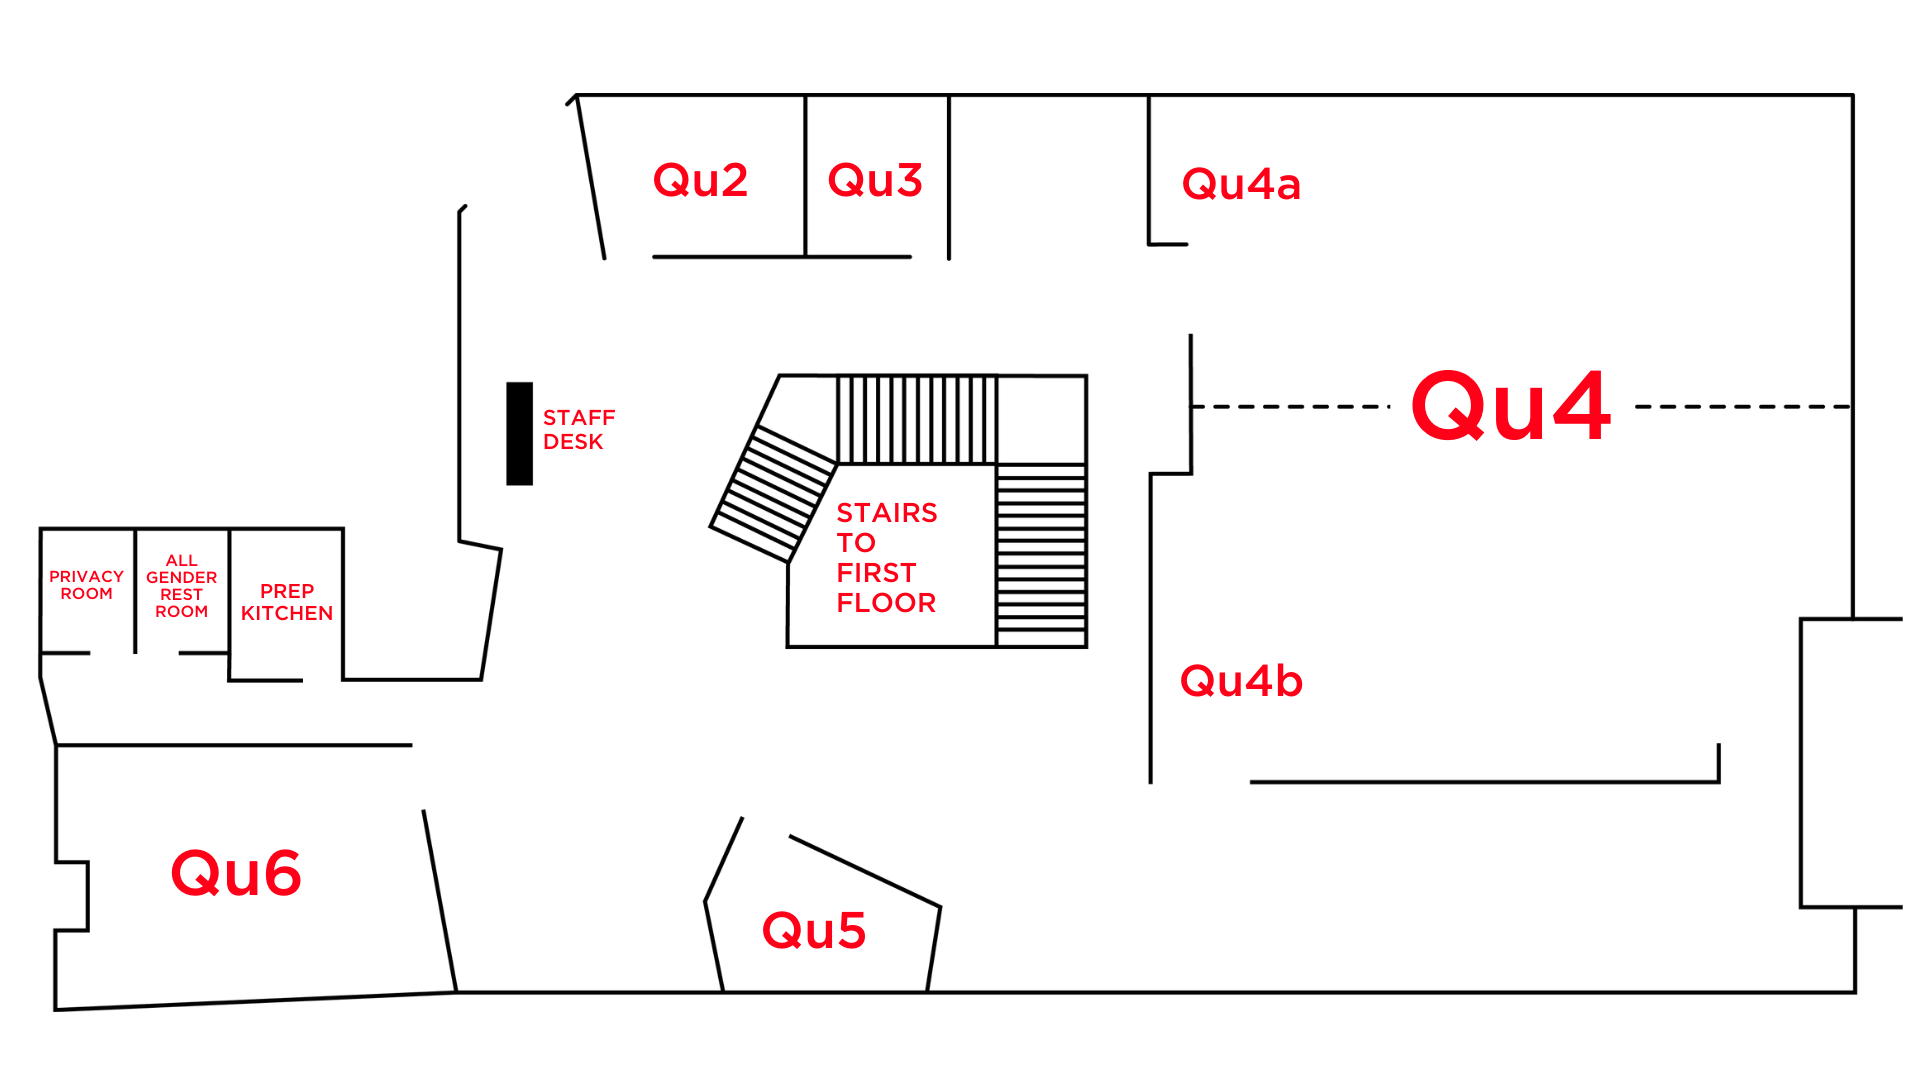 Quorum Second Floor